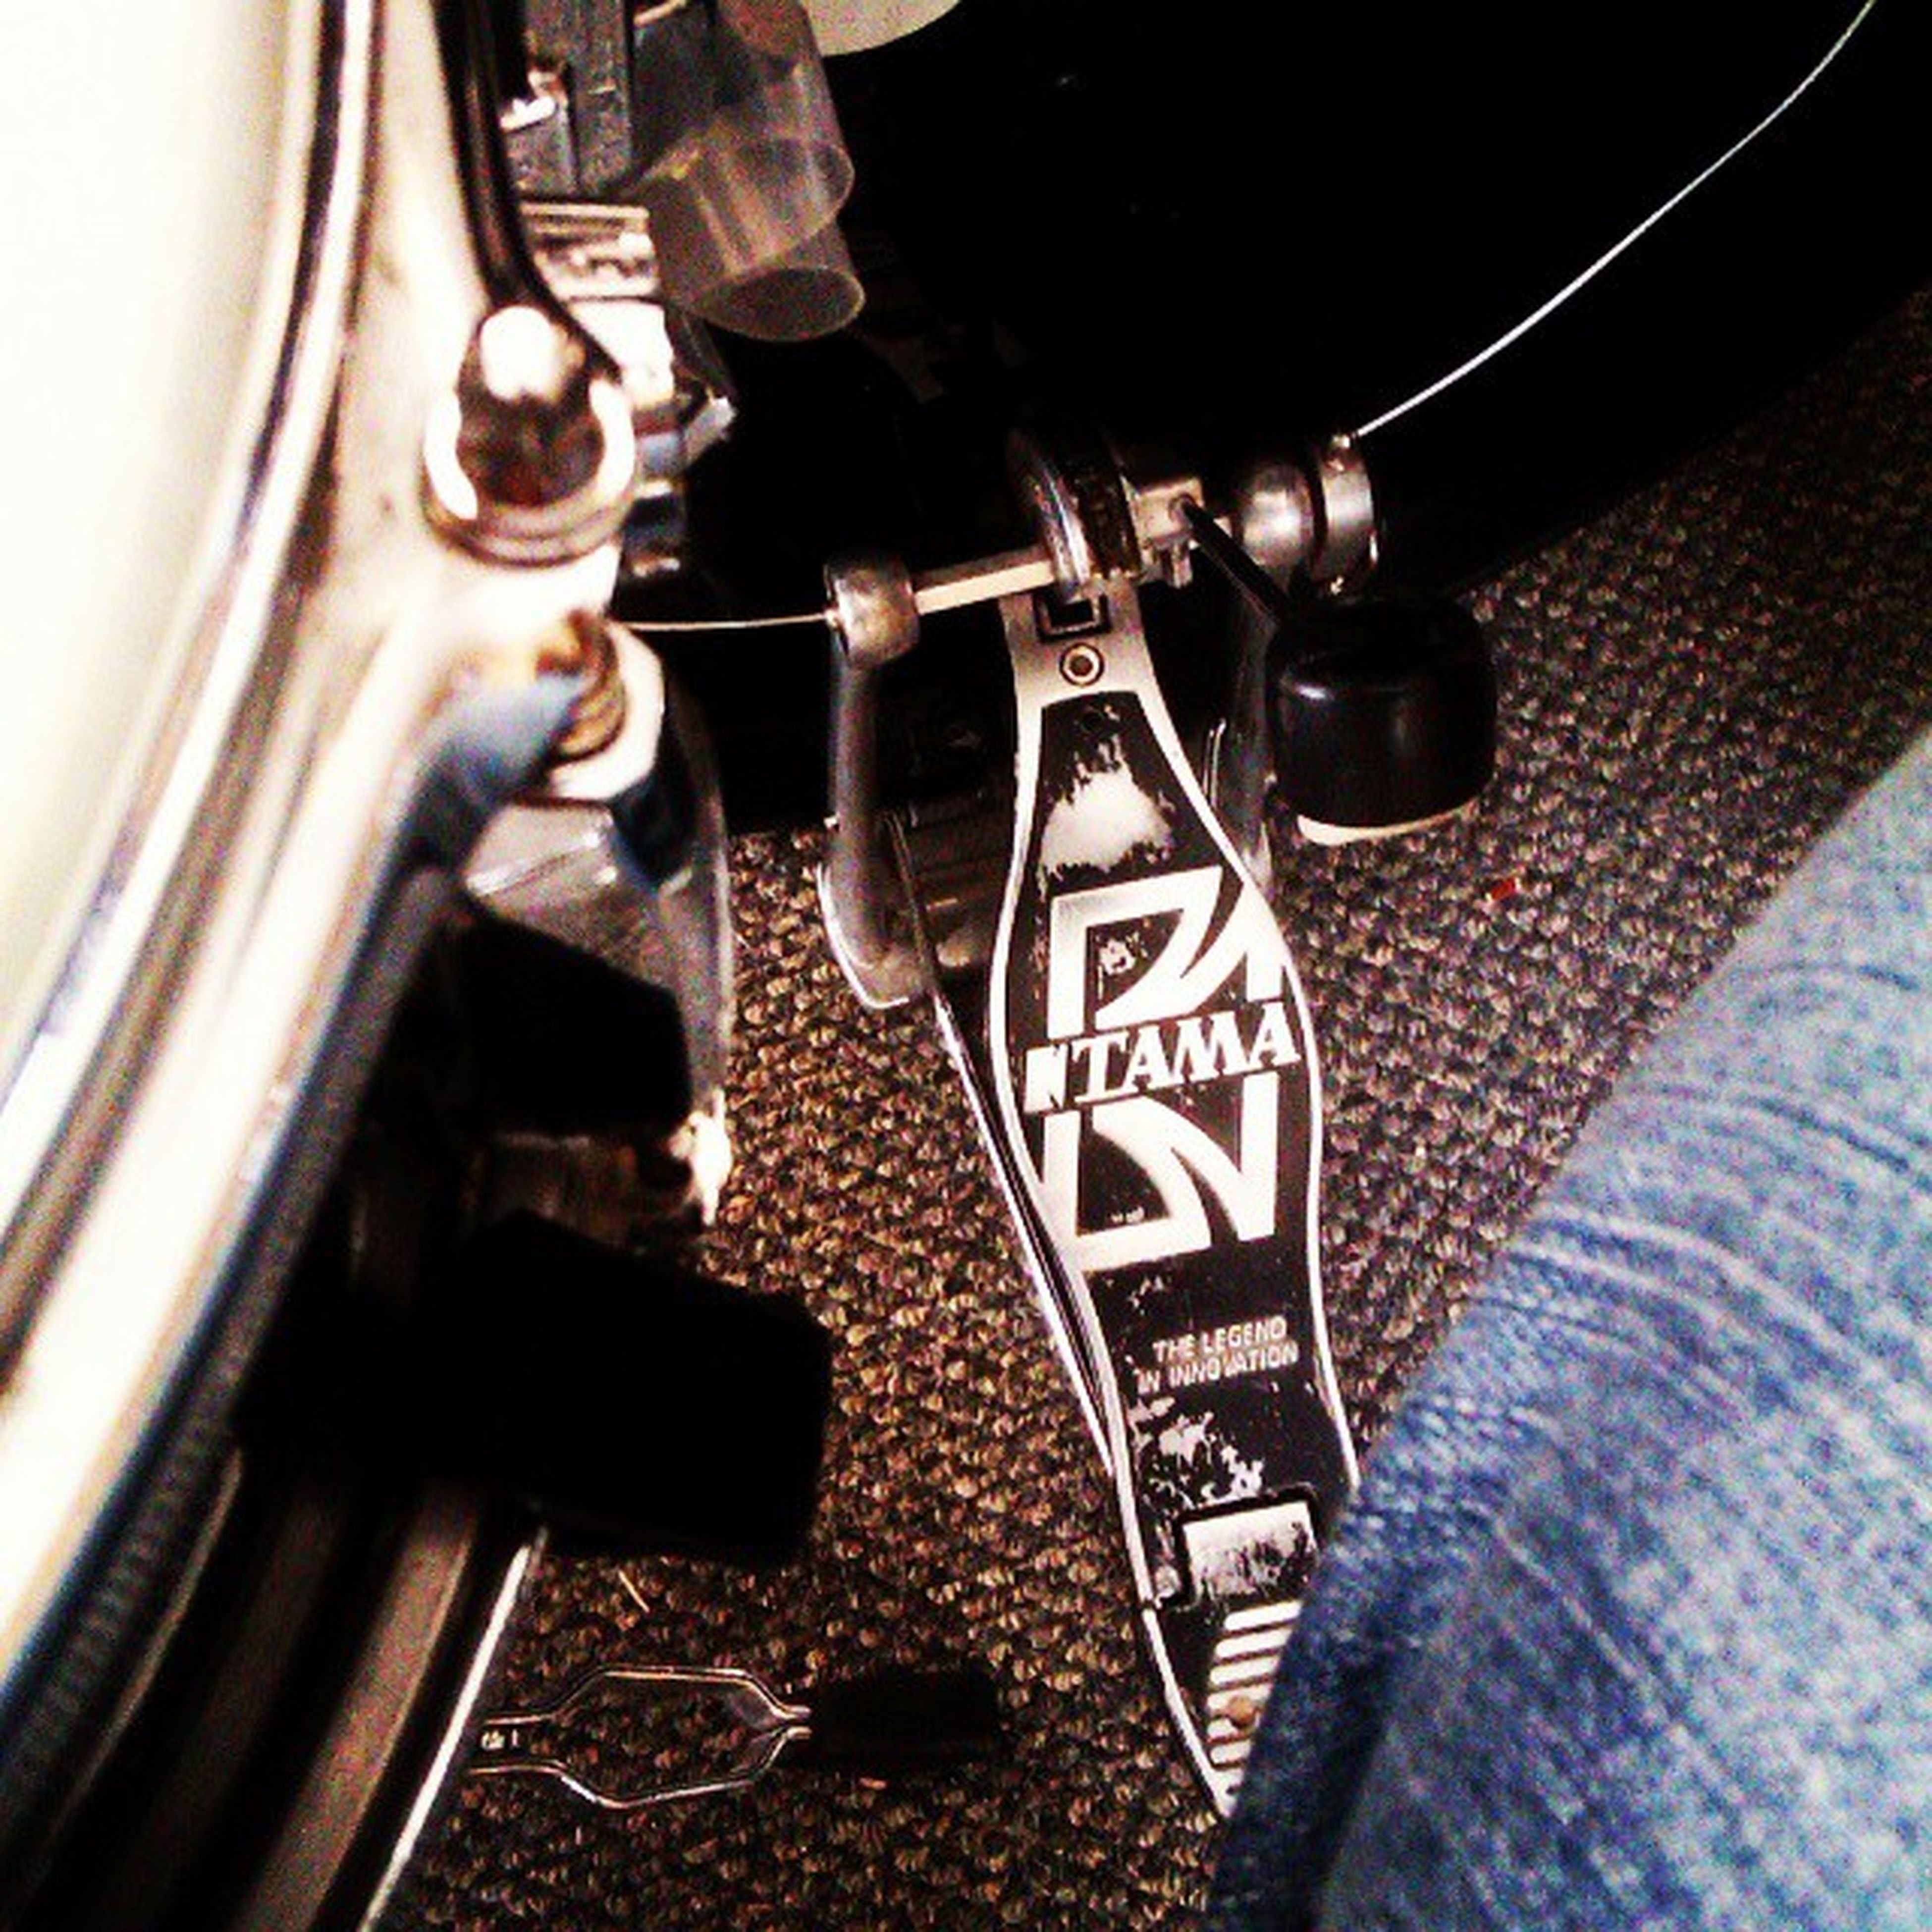 Tama Tamadrums Drum Drumer Zildjay Dwdrums Hipster EdgarEsGay Bateria Baterista YoSoy132